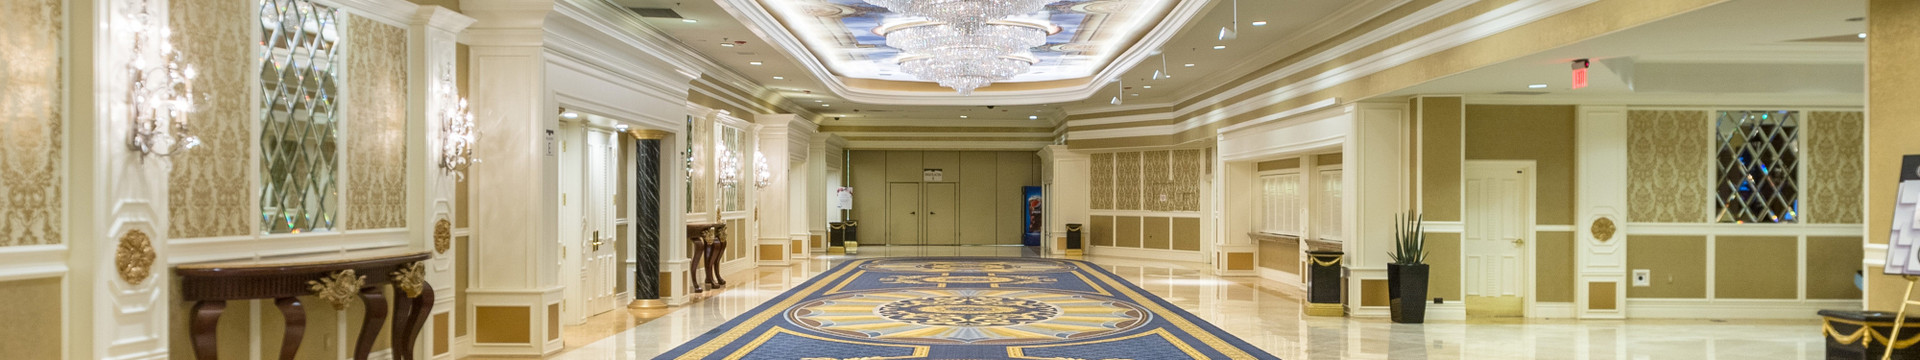 How far is Westgate Las Vegas Resort from Las Vegas convention center?